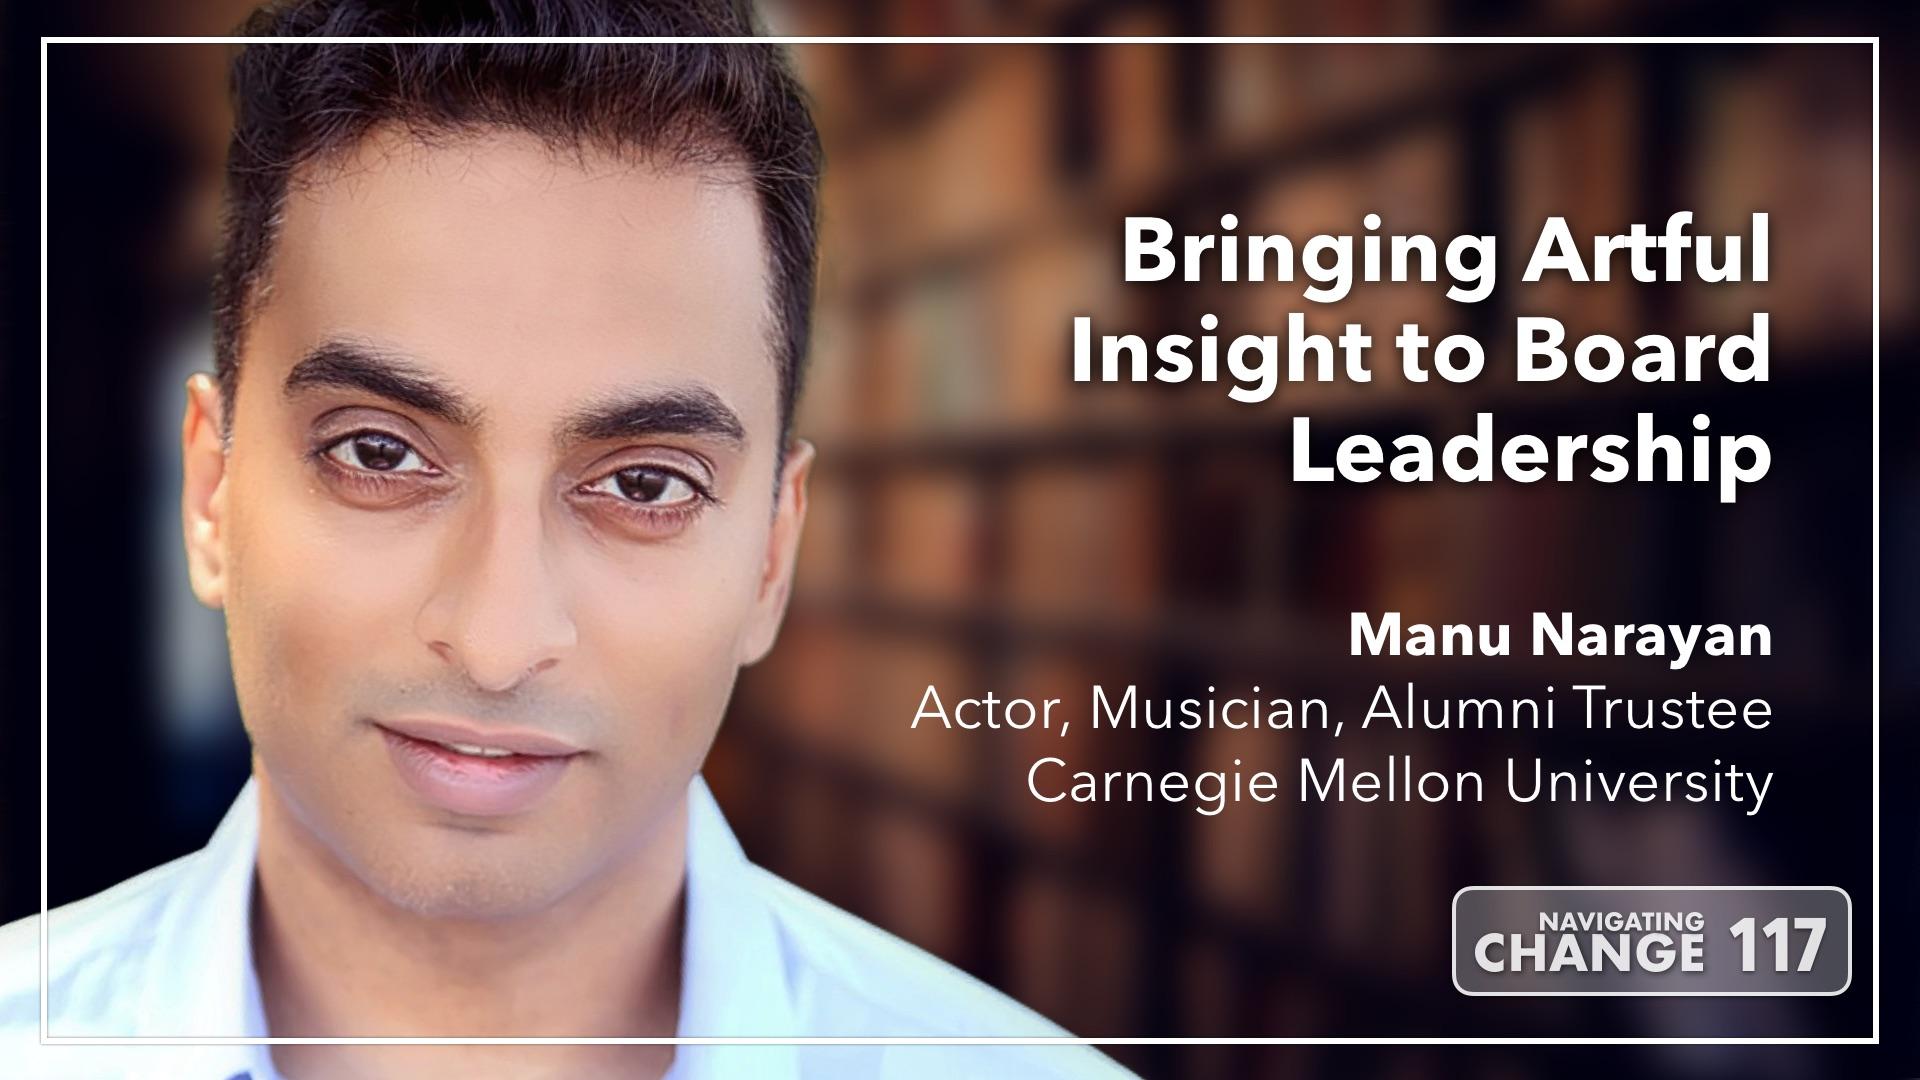 Listen to Manu Narayan on Board Leadership at Carnegie Mellon University